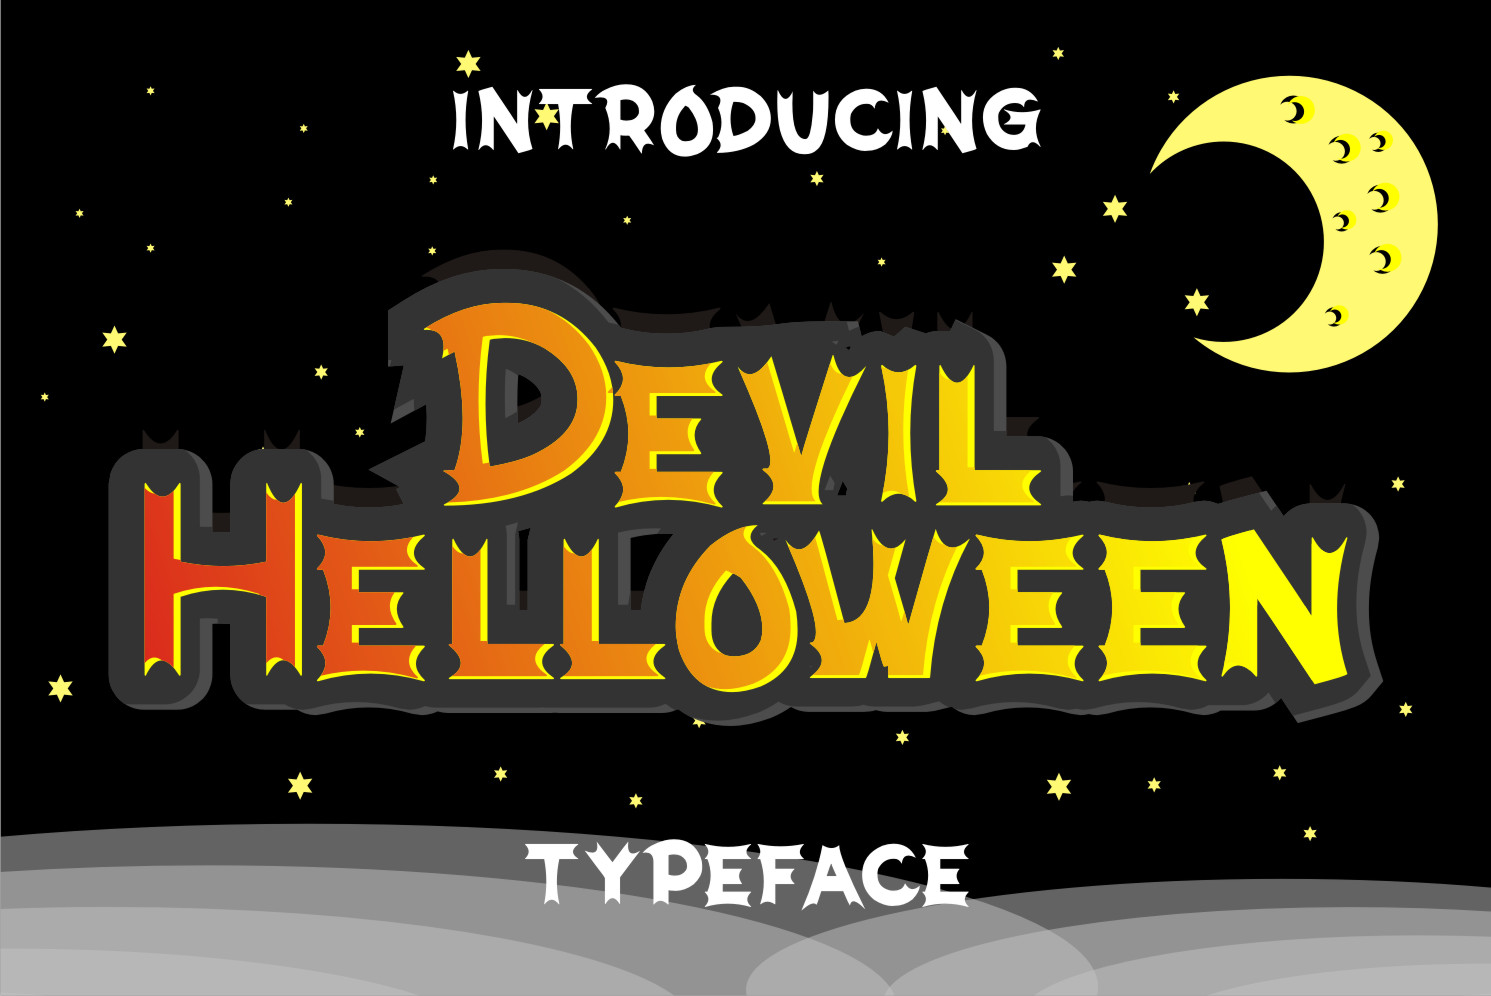 Devil Helloween Display Font